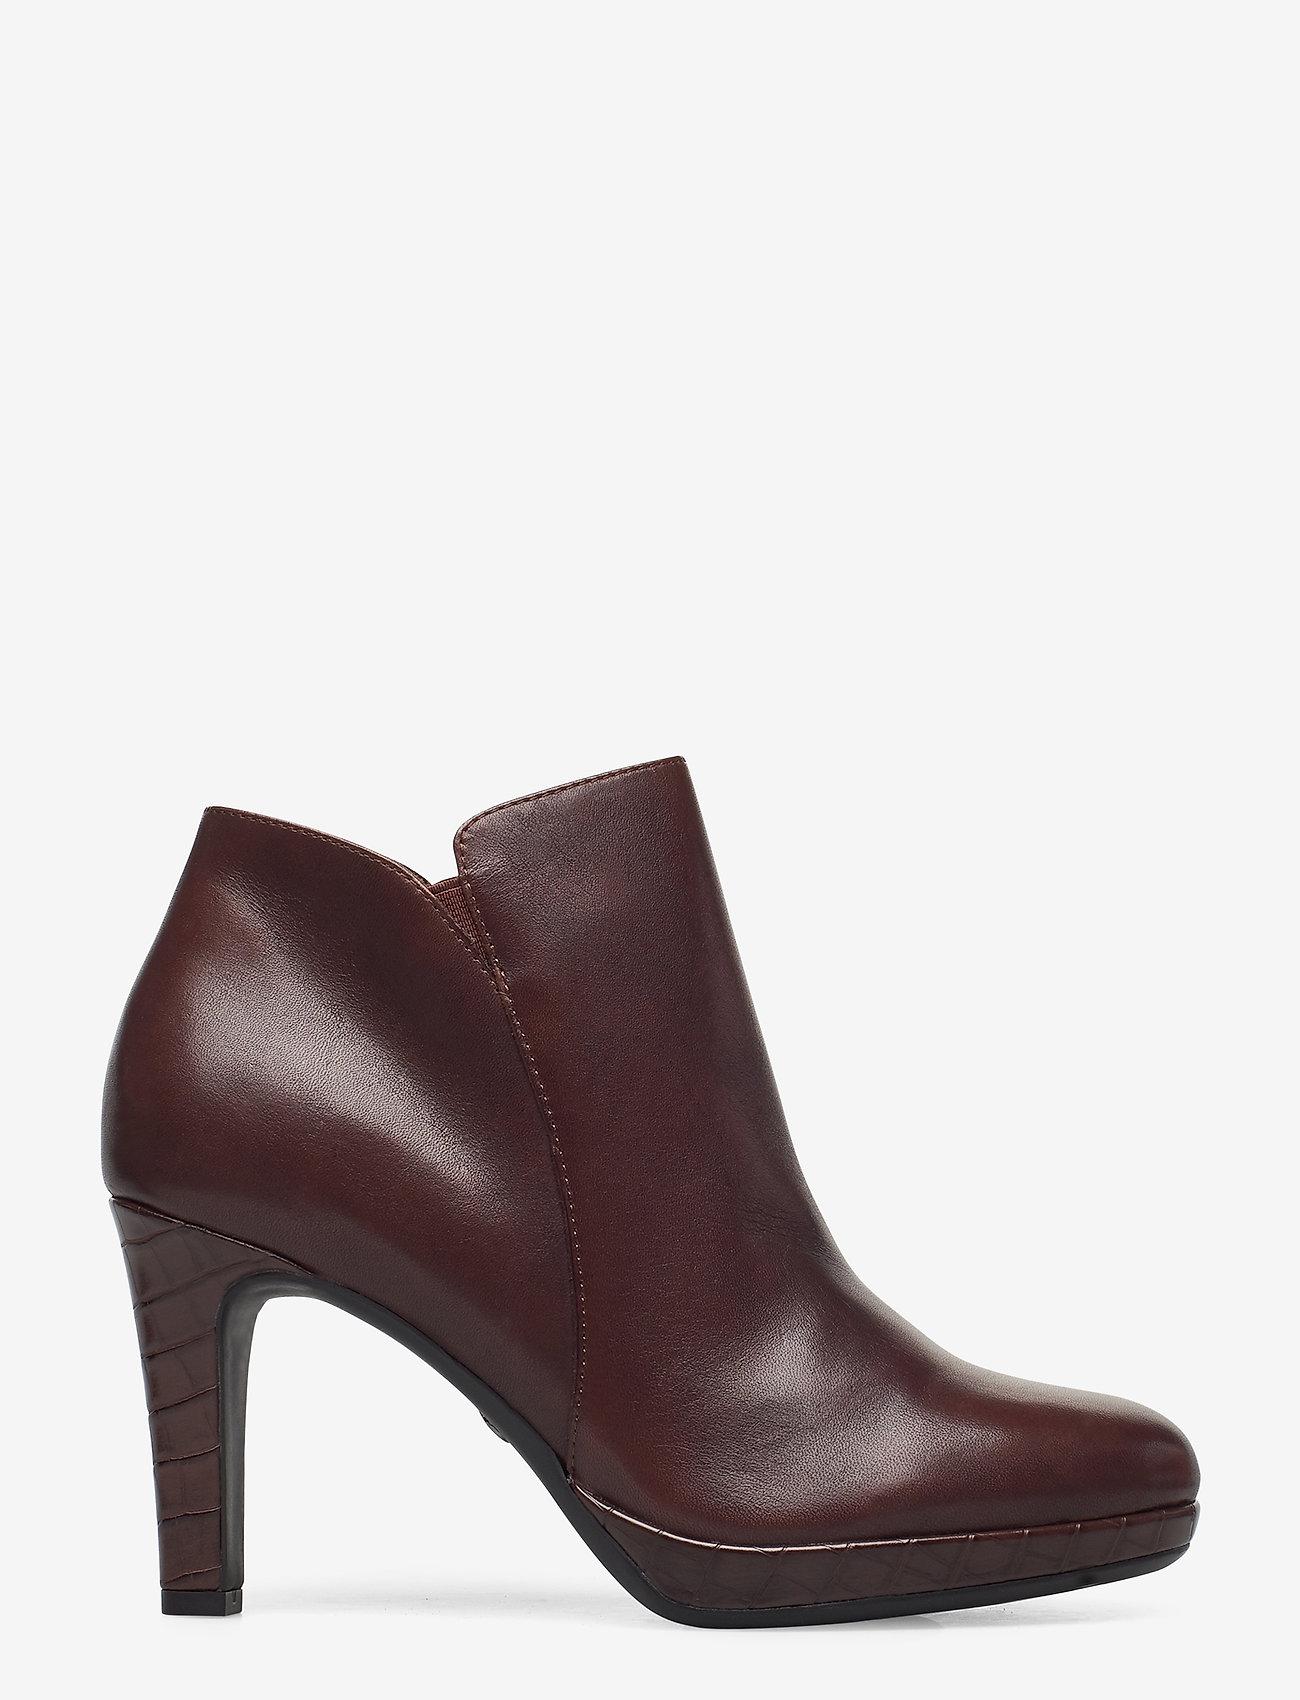 Tamaris - Woms Boots - enkellaarsjes met hak - maroon/croco - 1